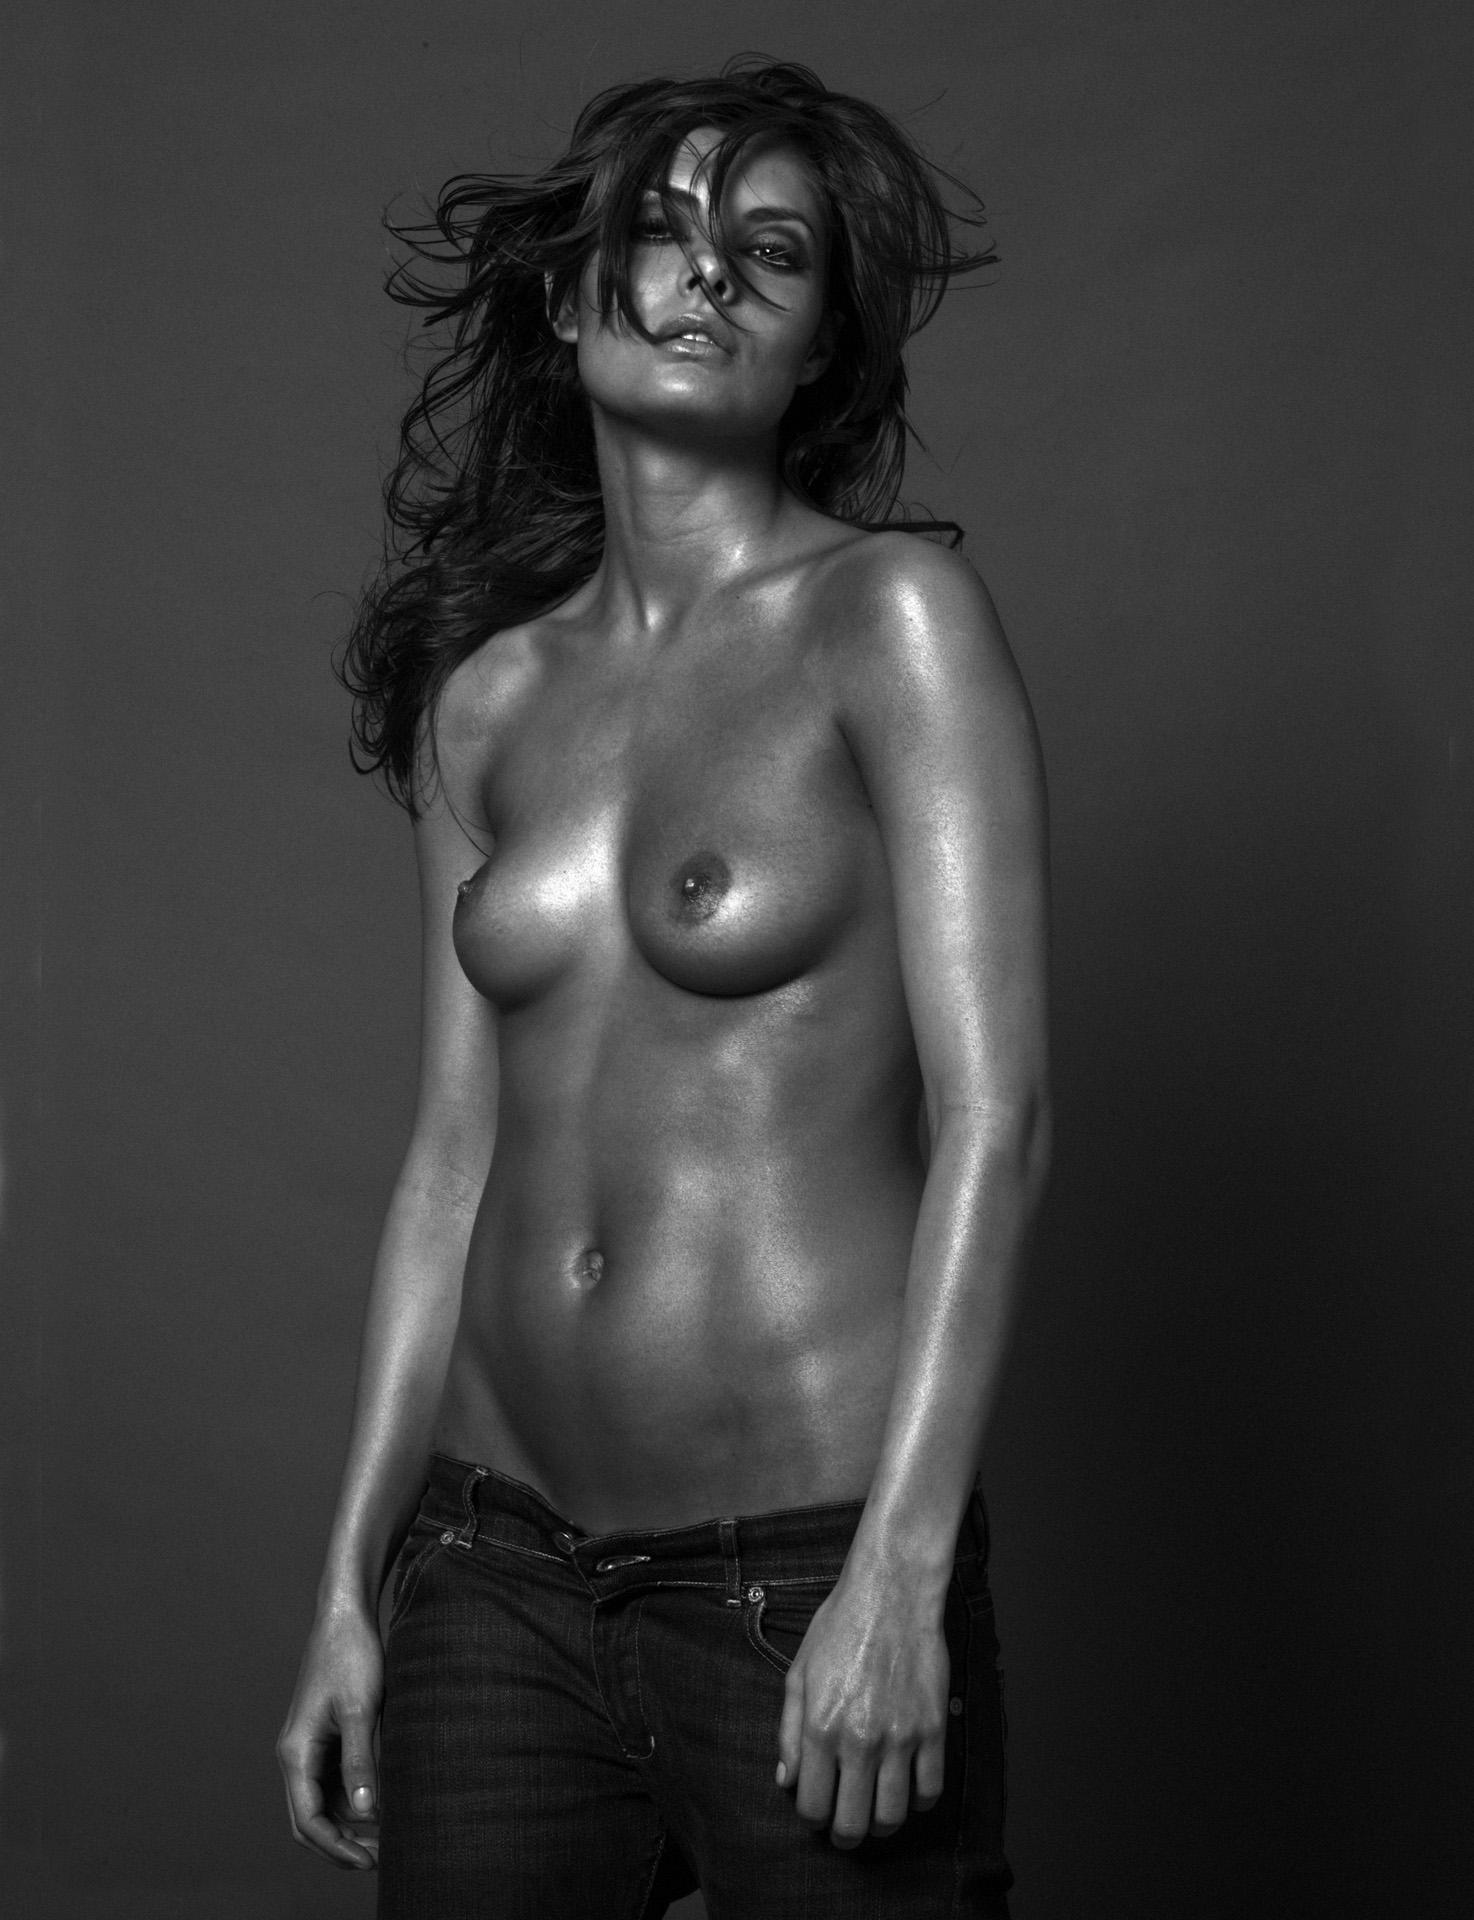 Roberto Aguilar_Photographer_roll4 150.jpg